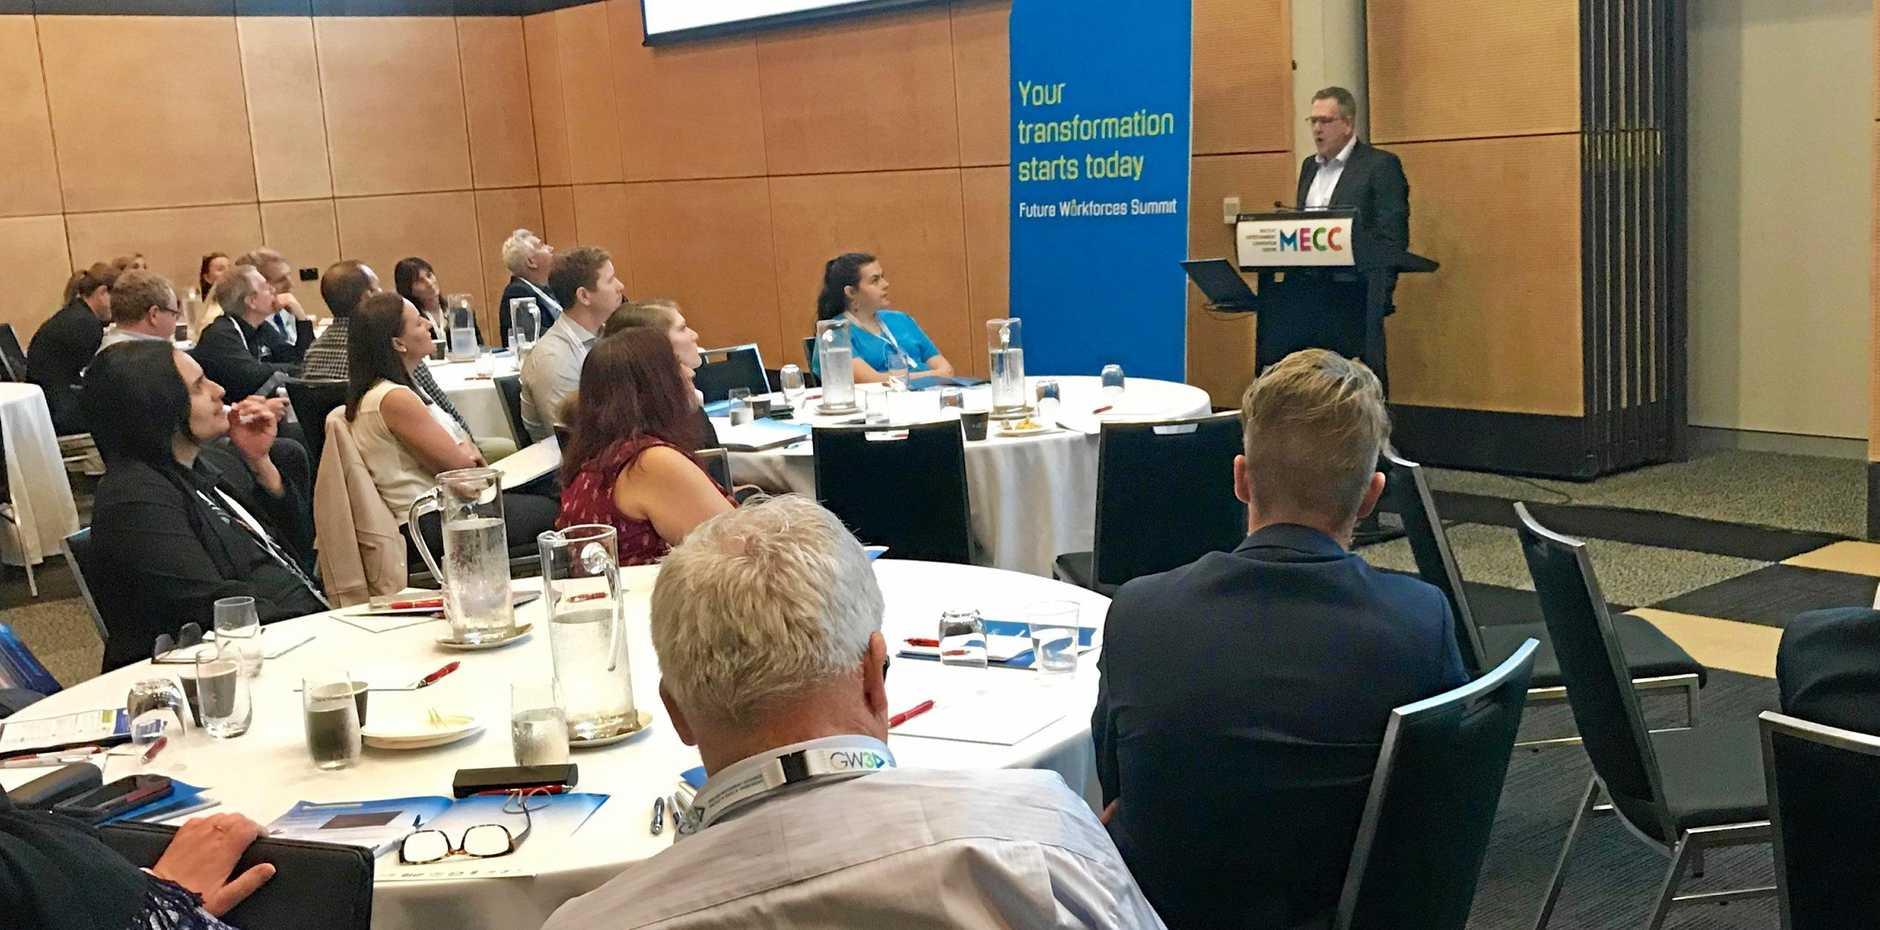 University of Technology Sydney senior lecturer Gerard De Valence addresses the Construction stream breakout at GW3's Future Workforces Summit.